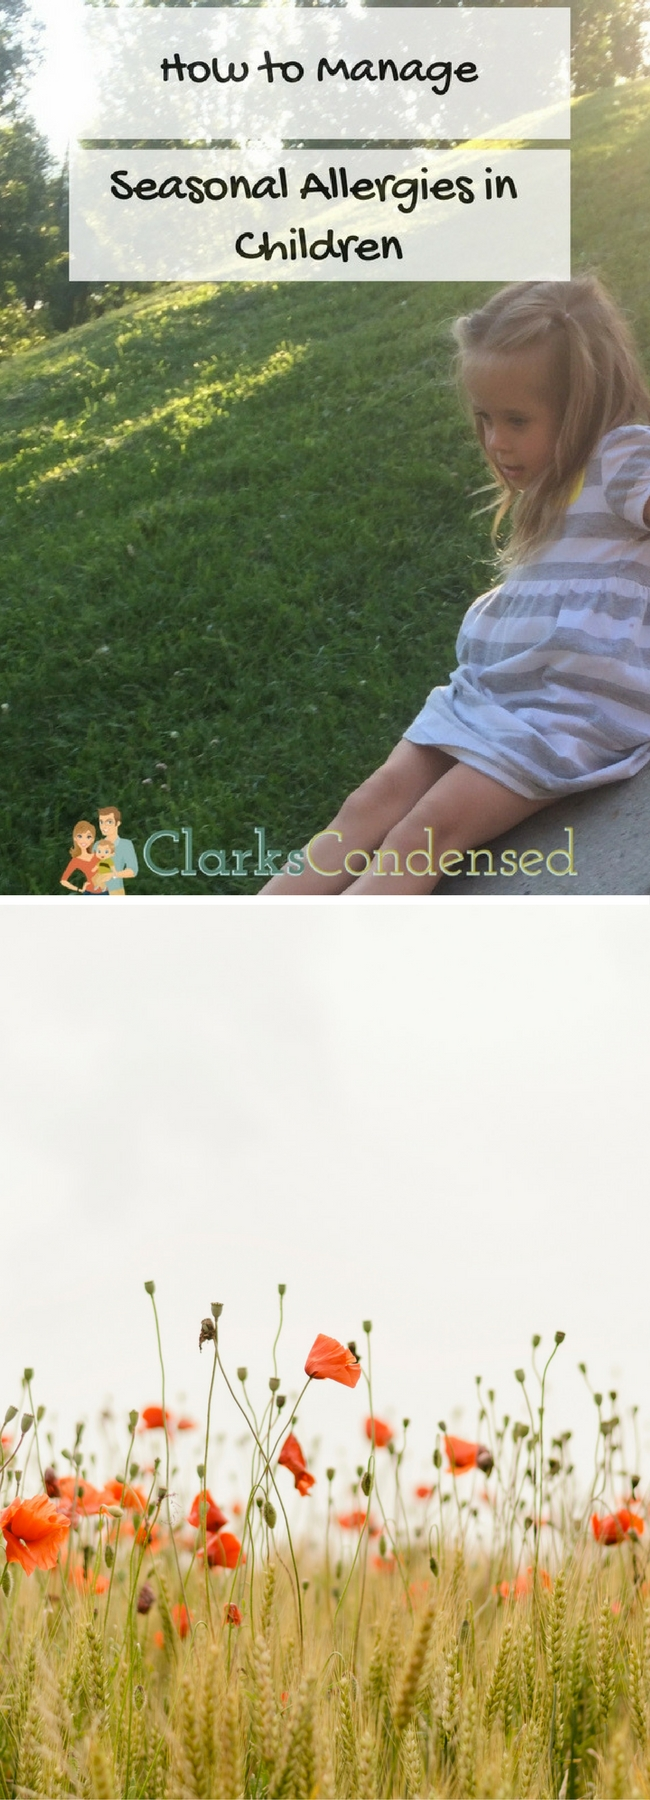 How To Help Manage Seasonal Allergies in Children via @clarkscondensed